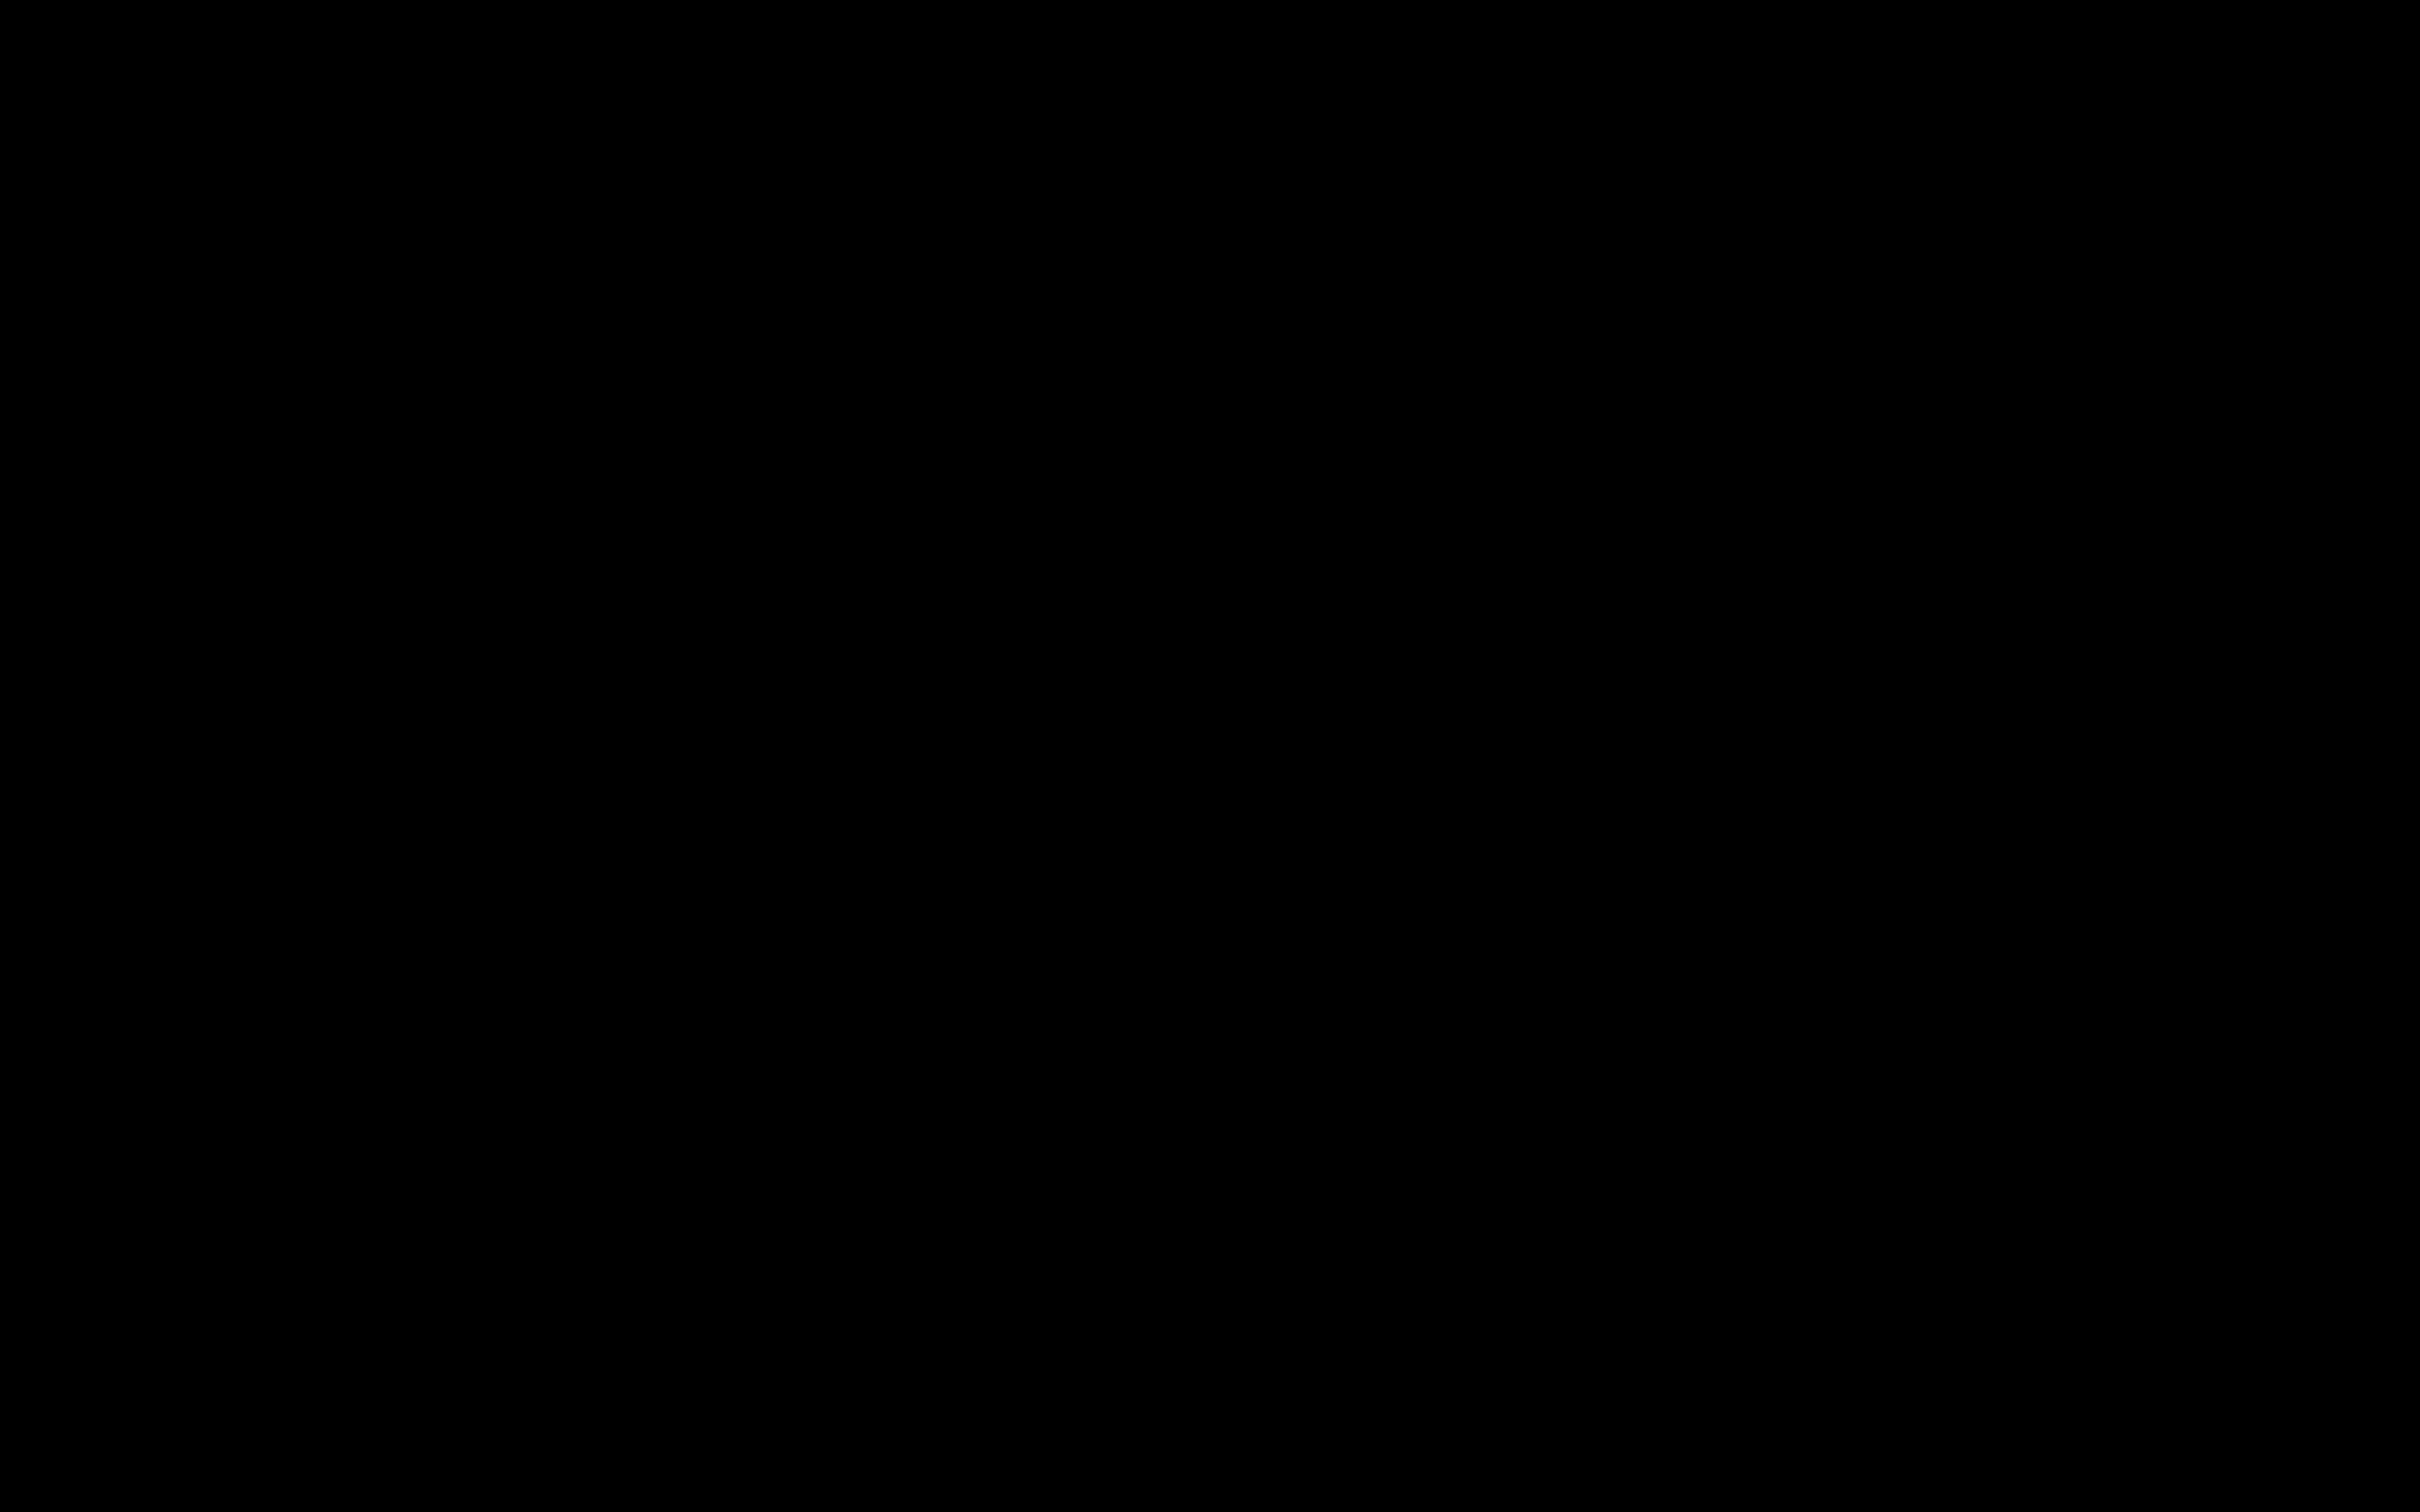 Black Blue White Inscription Wallpaper Background Ultra HD 4K 3840x2400